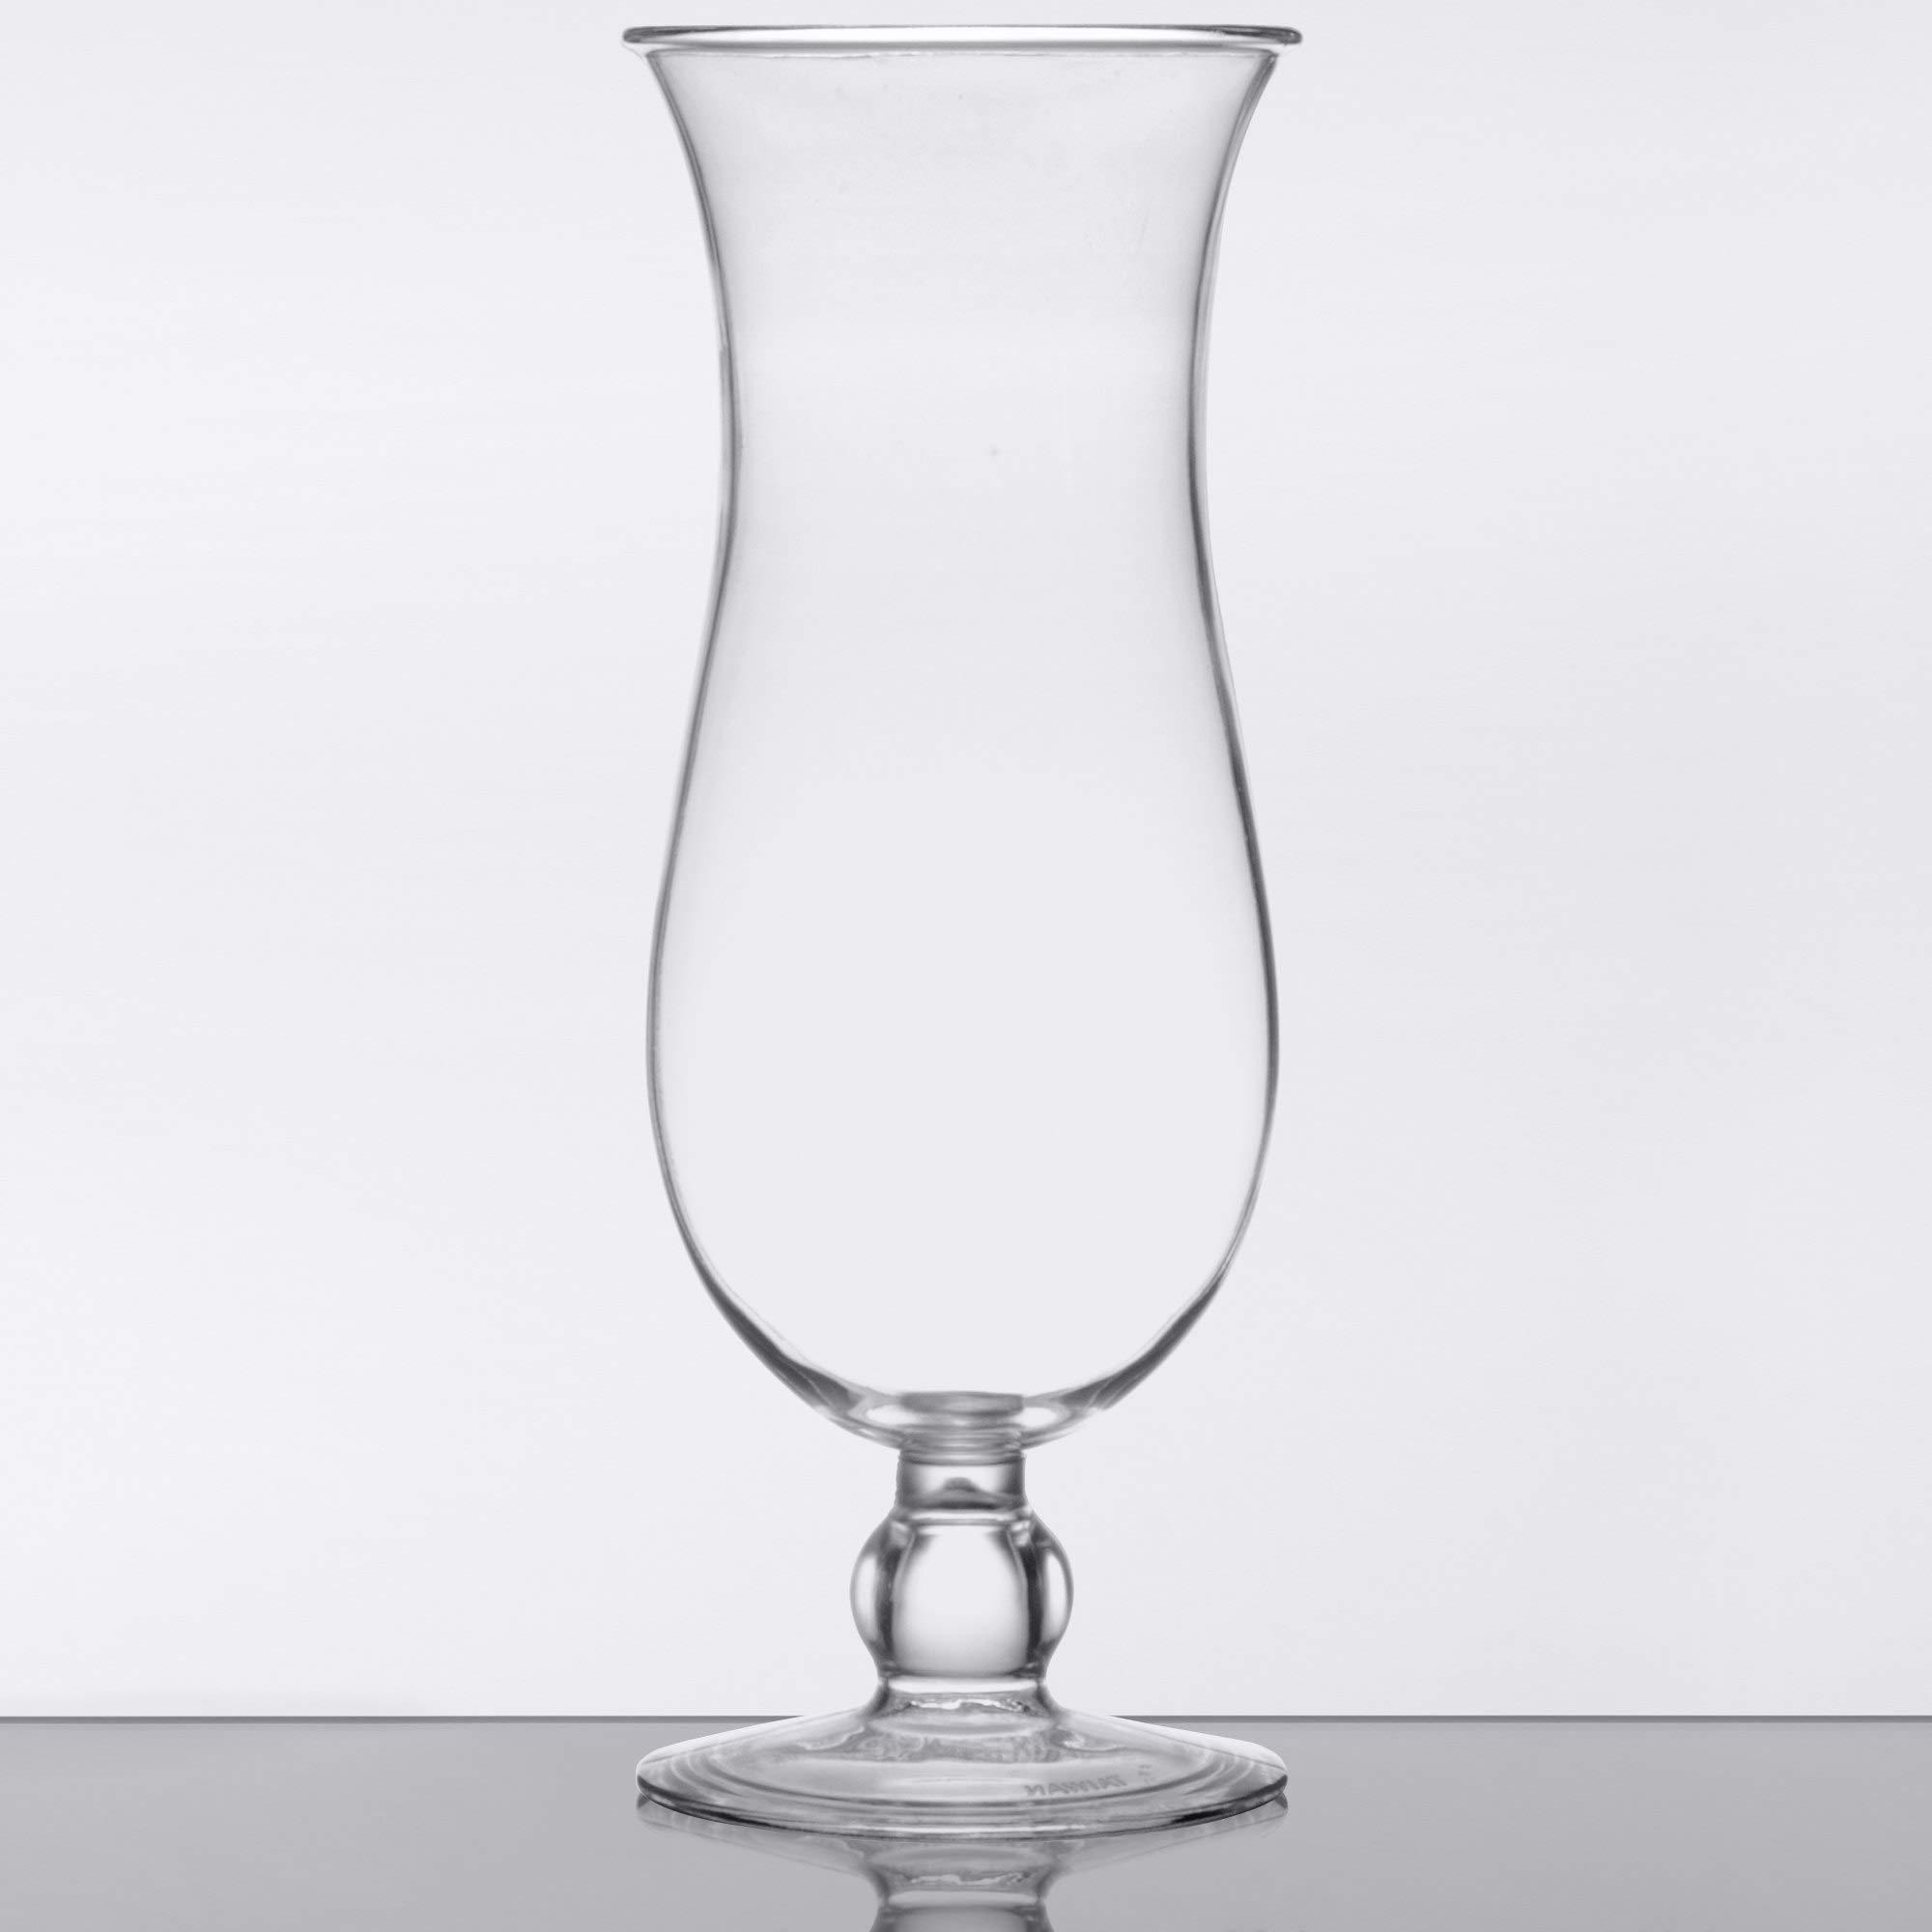 15 oz. Clear Plastic Hurricane Glasses, Break Resistant, Dishwasher Safe, Reusable, GET HUR-1-CL (Qty, 12) by Unknown